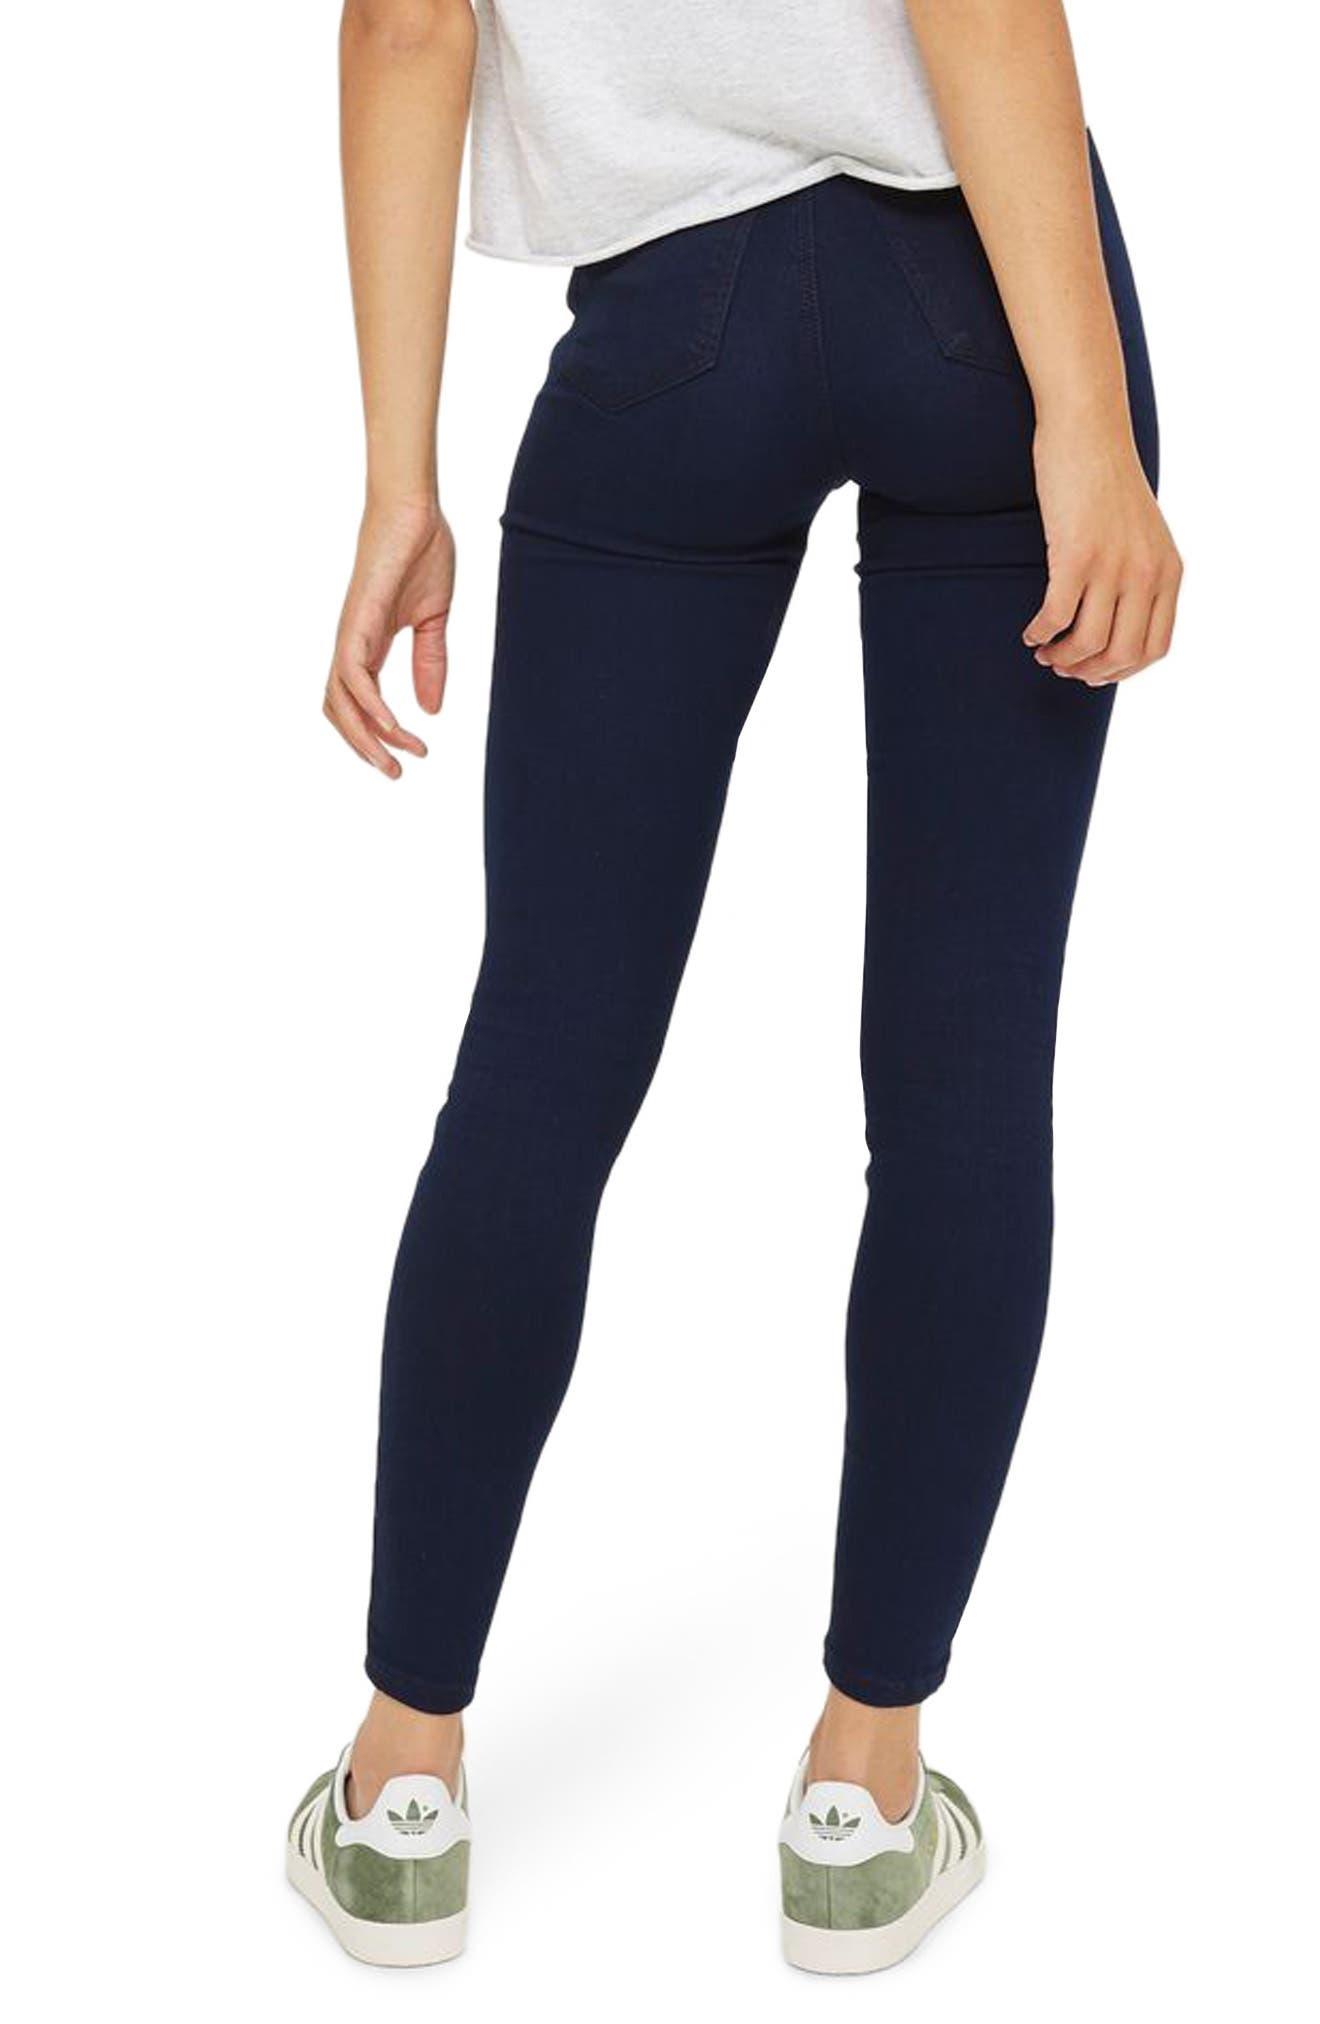 TOPSHOP, Joni High Waist Skinny Jeans, Alternate thumbnail 2, color, DARK INDIGO